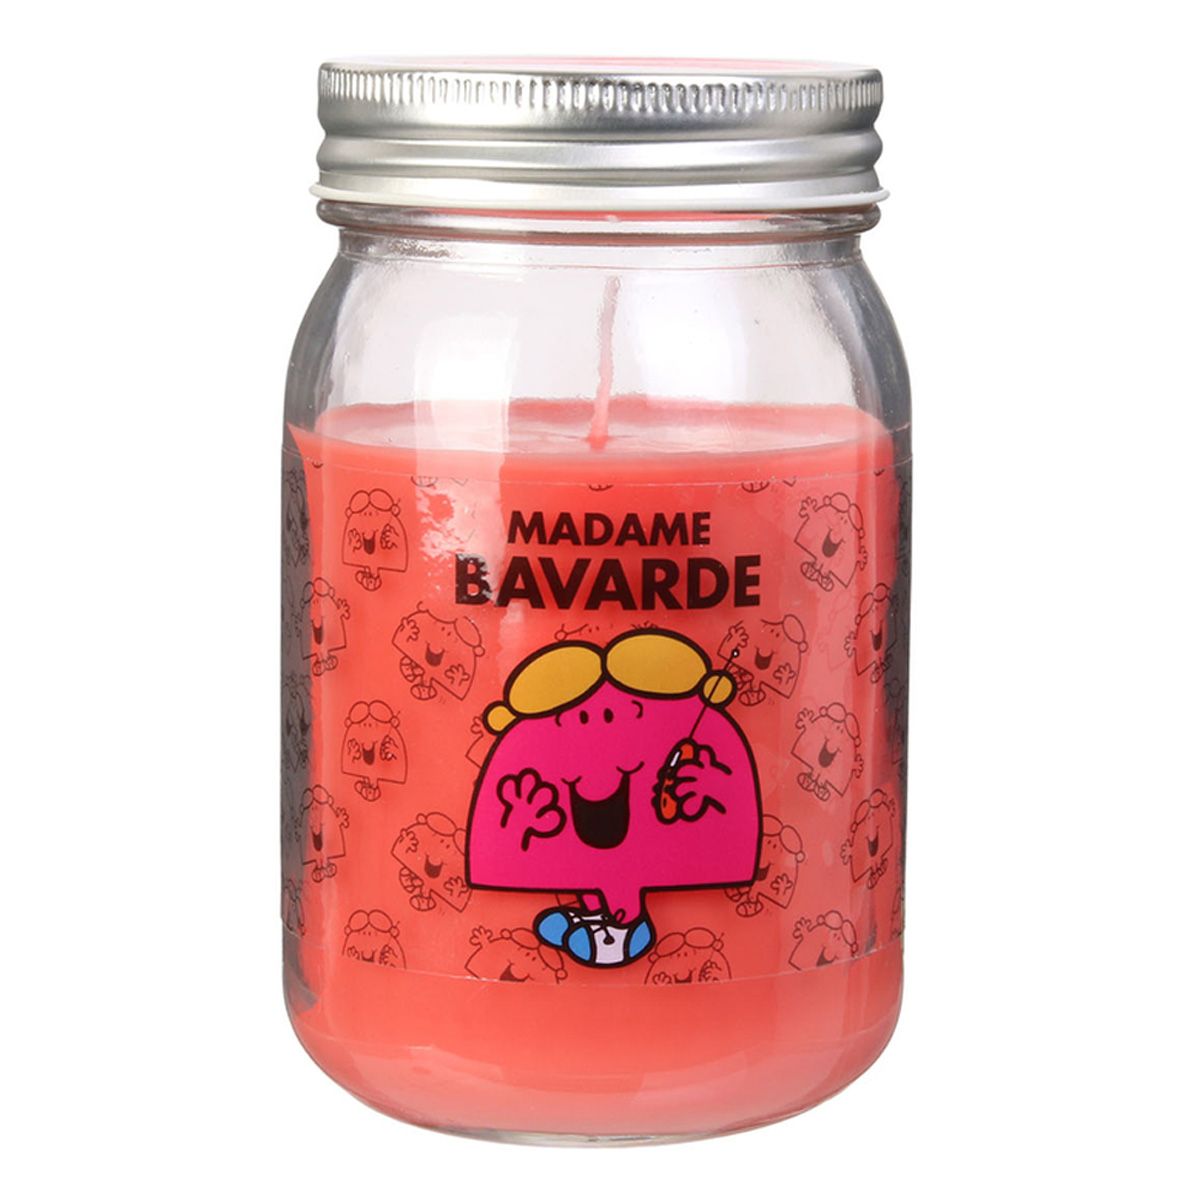 Bougie parfumée mason jar \'Monsieur Madame\' orange (Mme Bavarde) - 13x75 cm - [R0298]